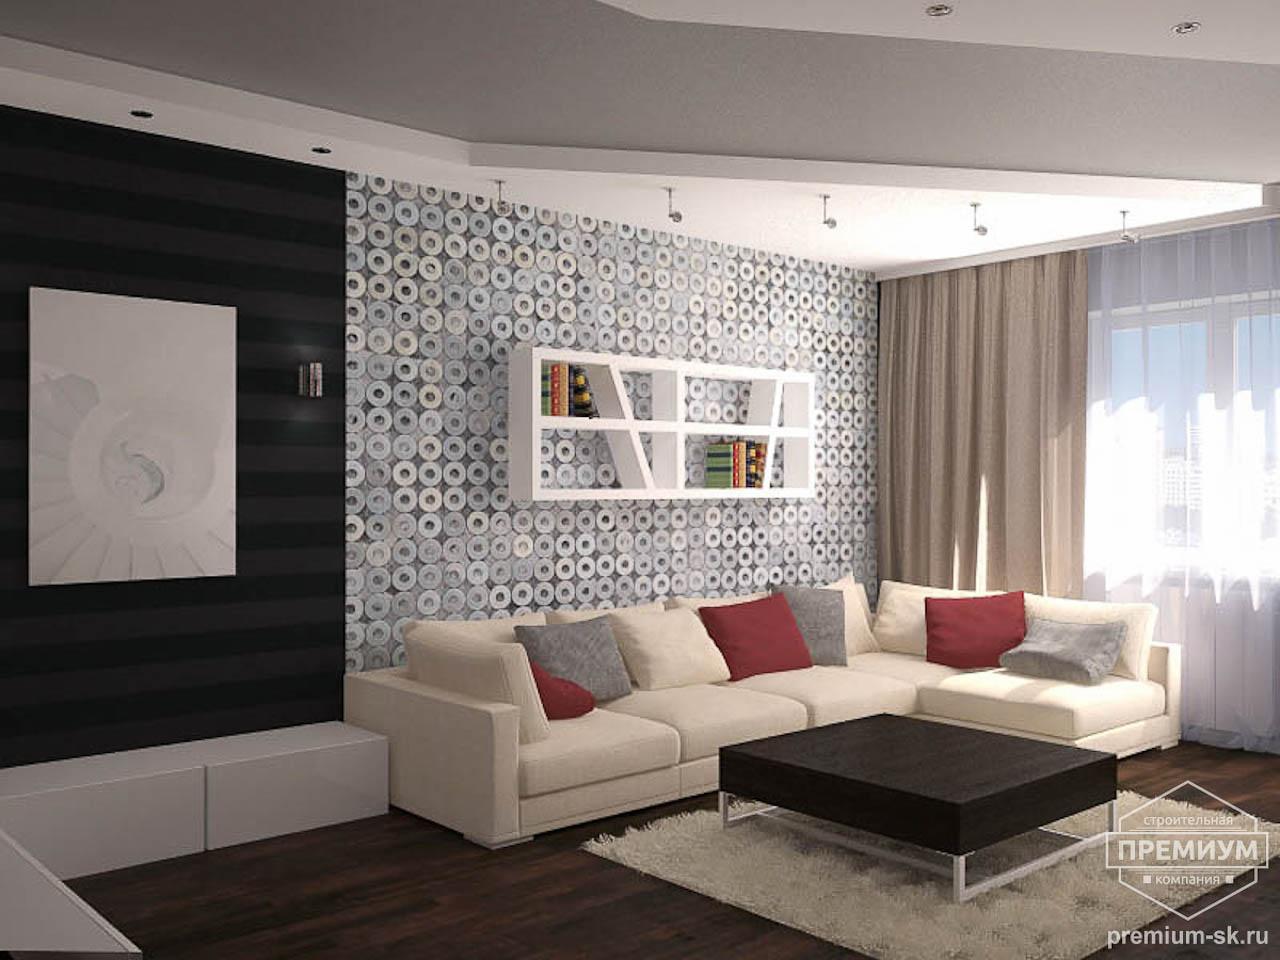 Дизайн интерьера однокомнатной квартиры по ул. Сыромолотова 11 img1682525669